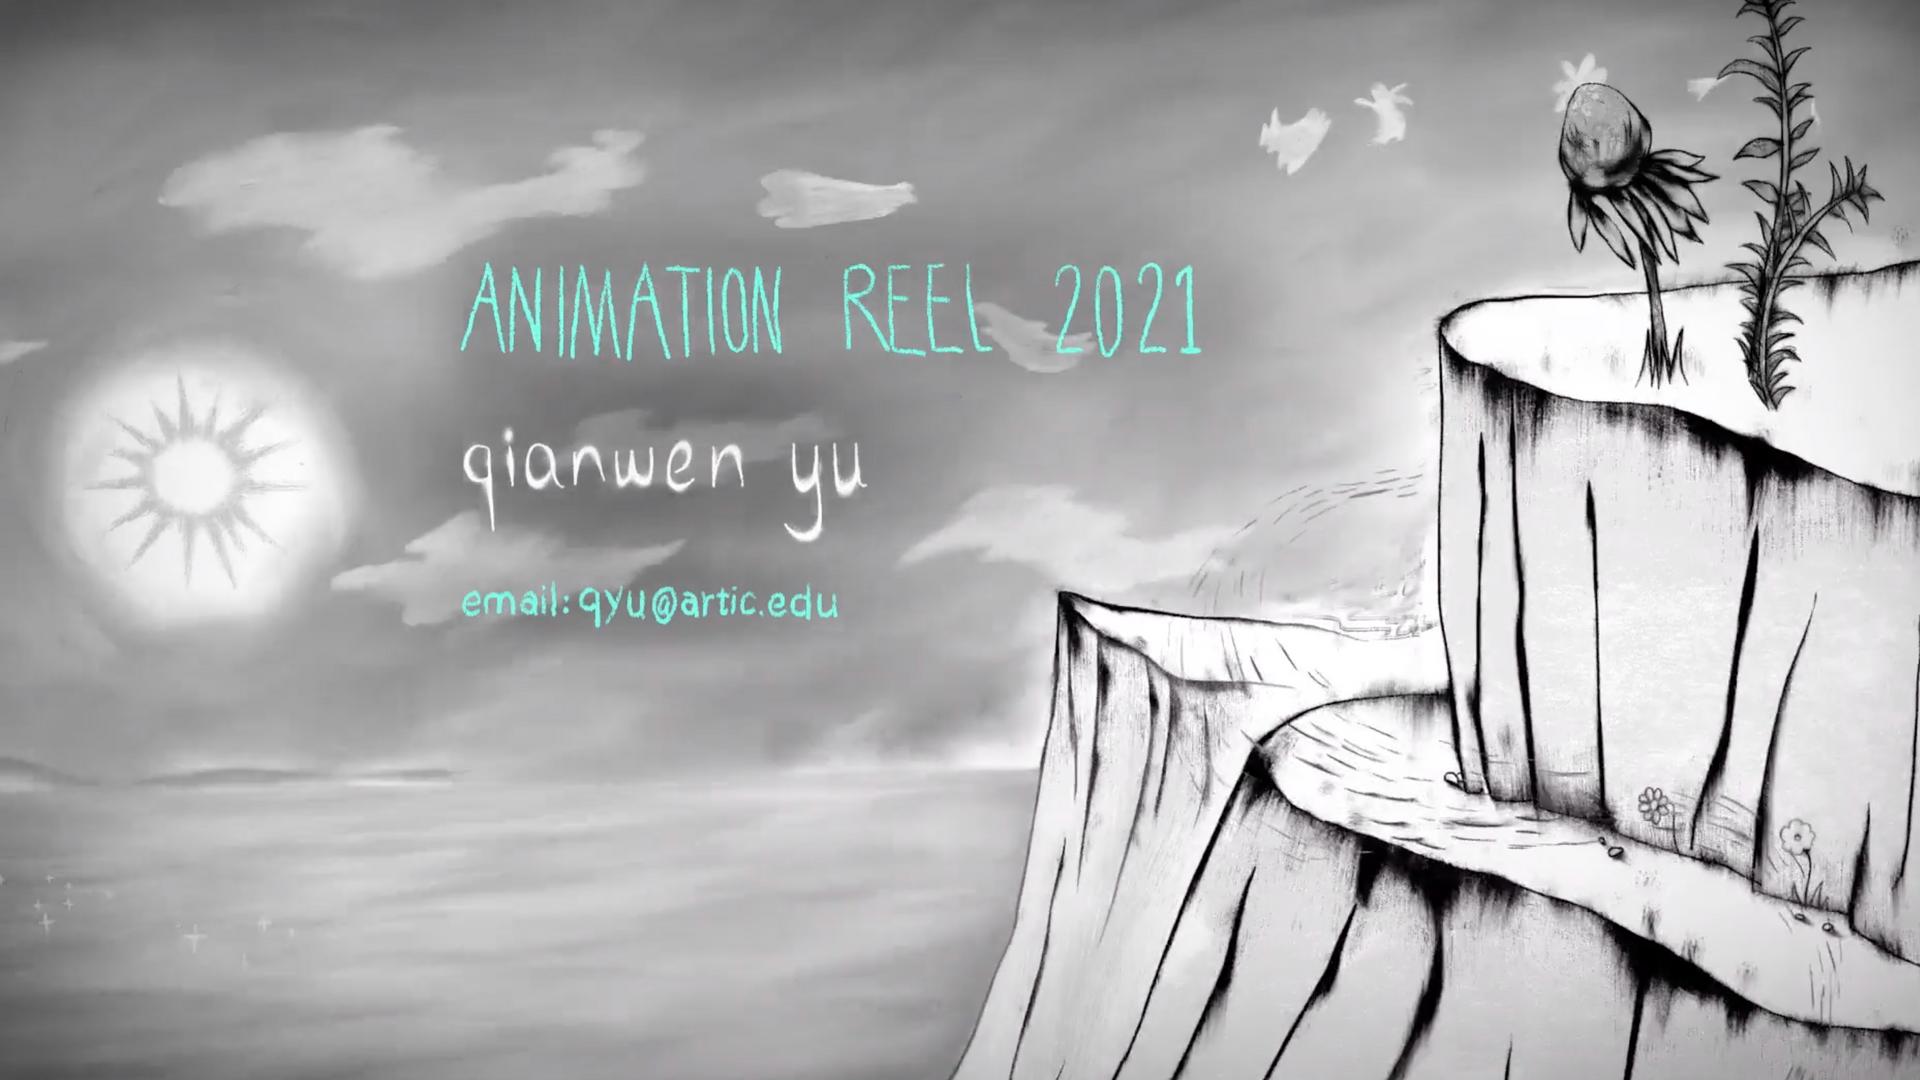 Animation Reel 2018-2020